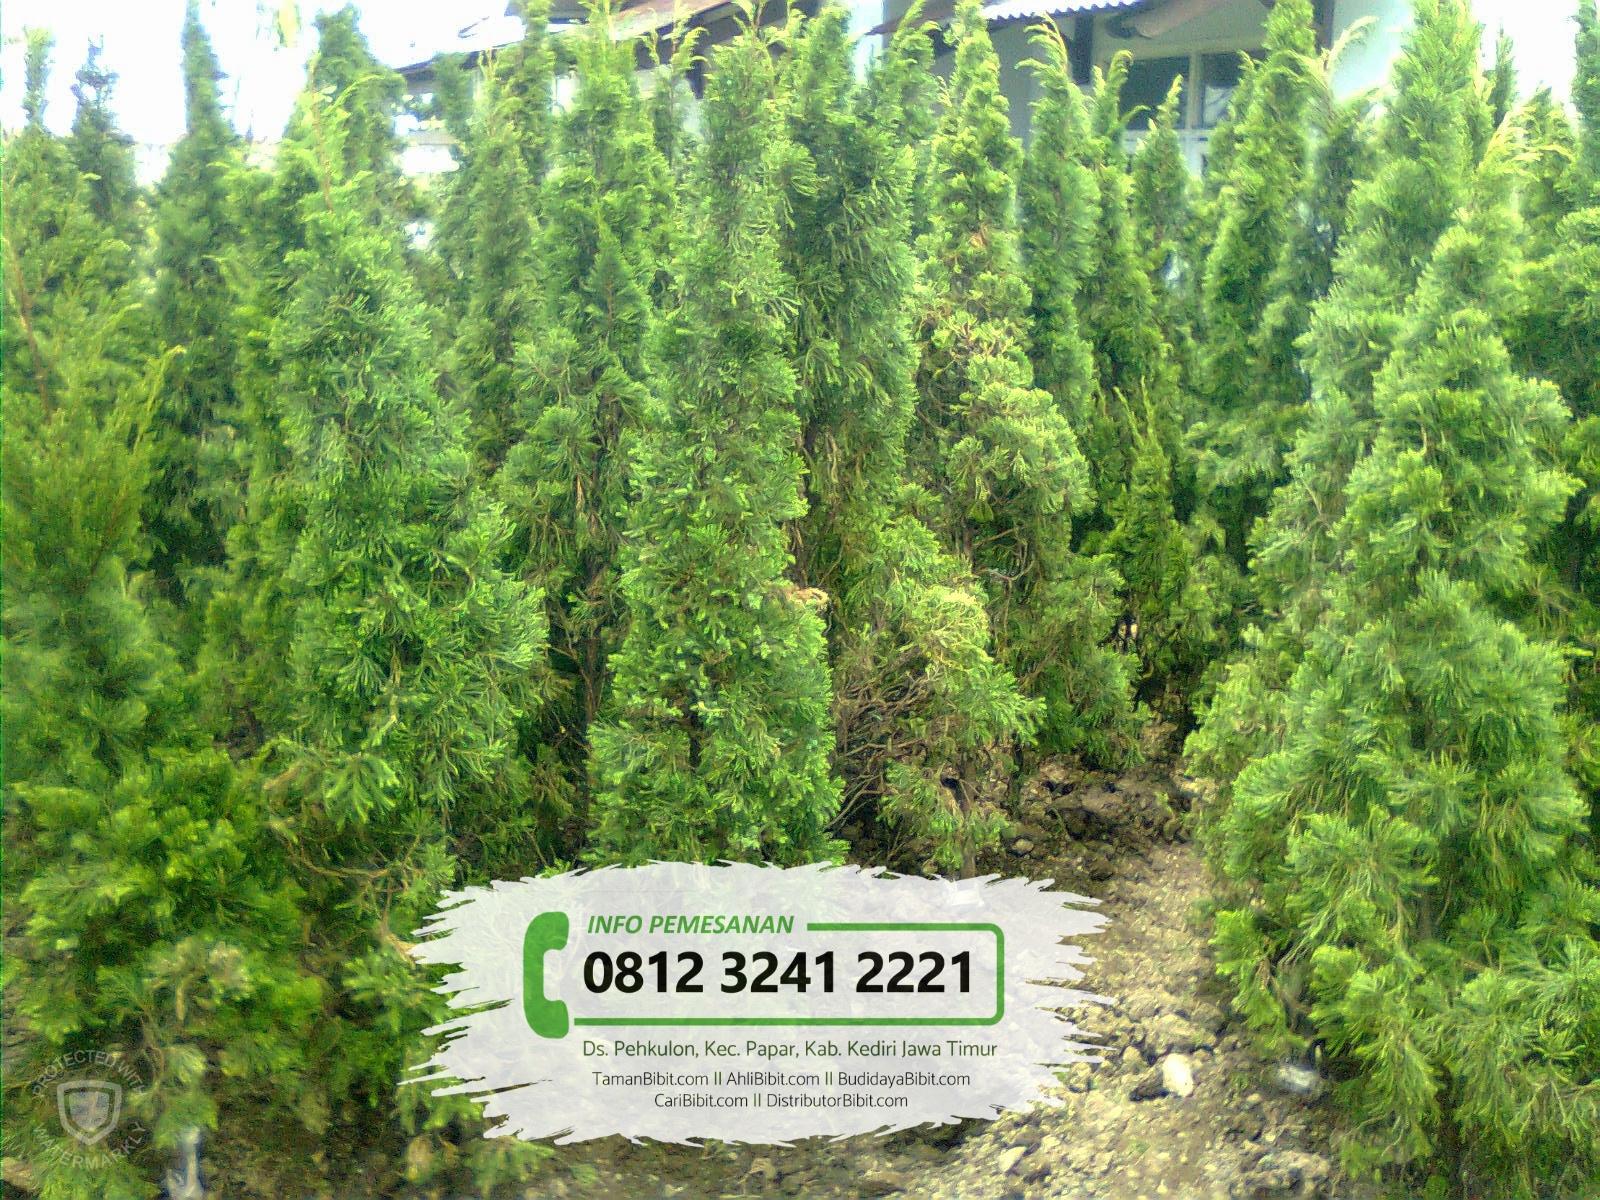 Jual Benih / Biji Pohon Cemara Papua